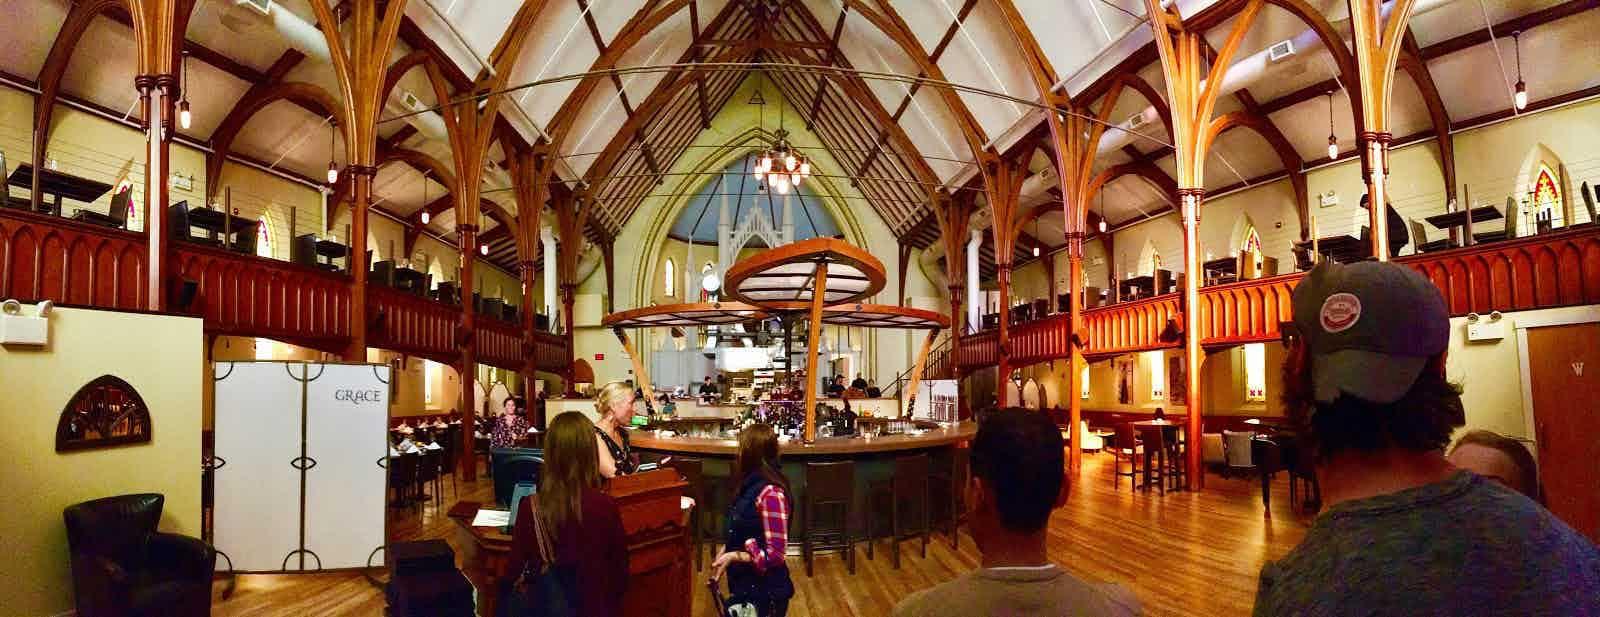 Grace - Portland | Restaurant Review - Zagat